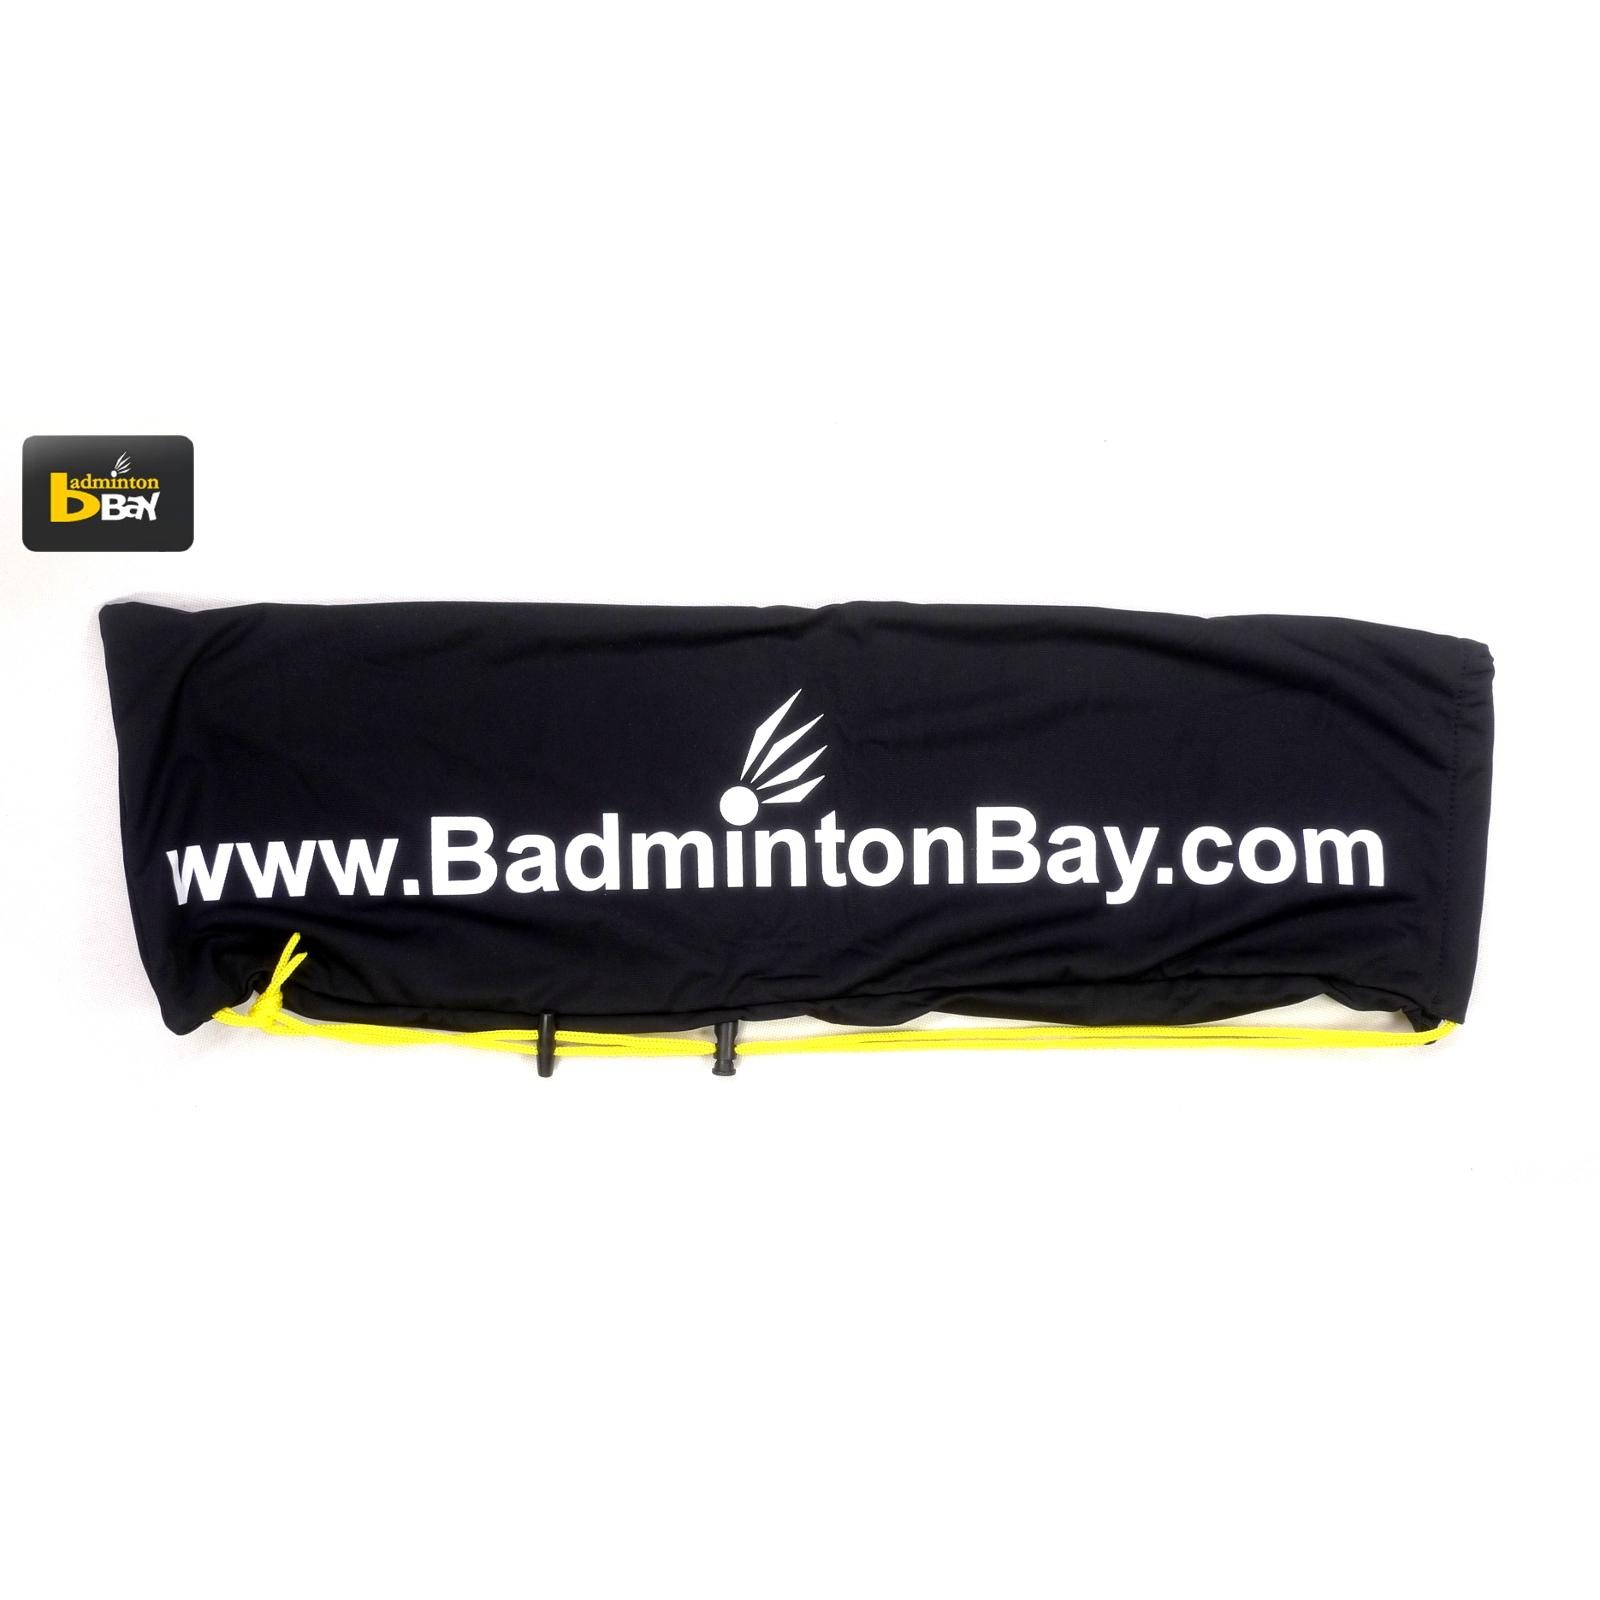 chun GUANG YU 2 Pieces Badminton Racket Equipment Unisex Badminton Racket Cover Badminton Racket Bag with Adjustable Shoulder Strap.